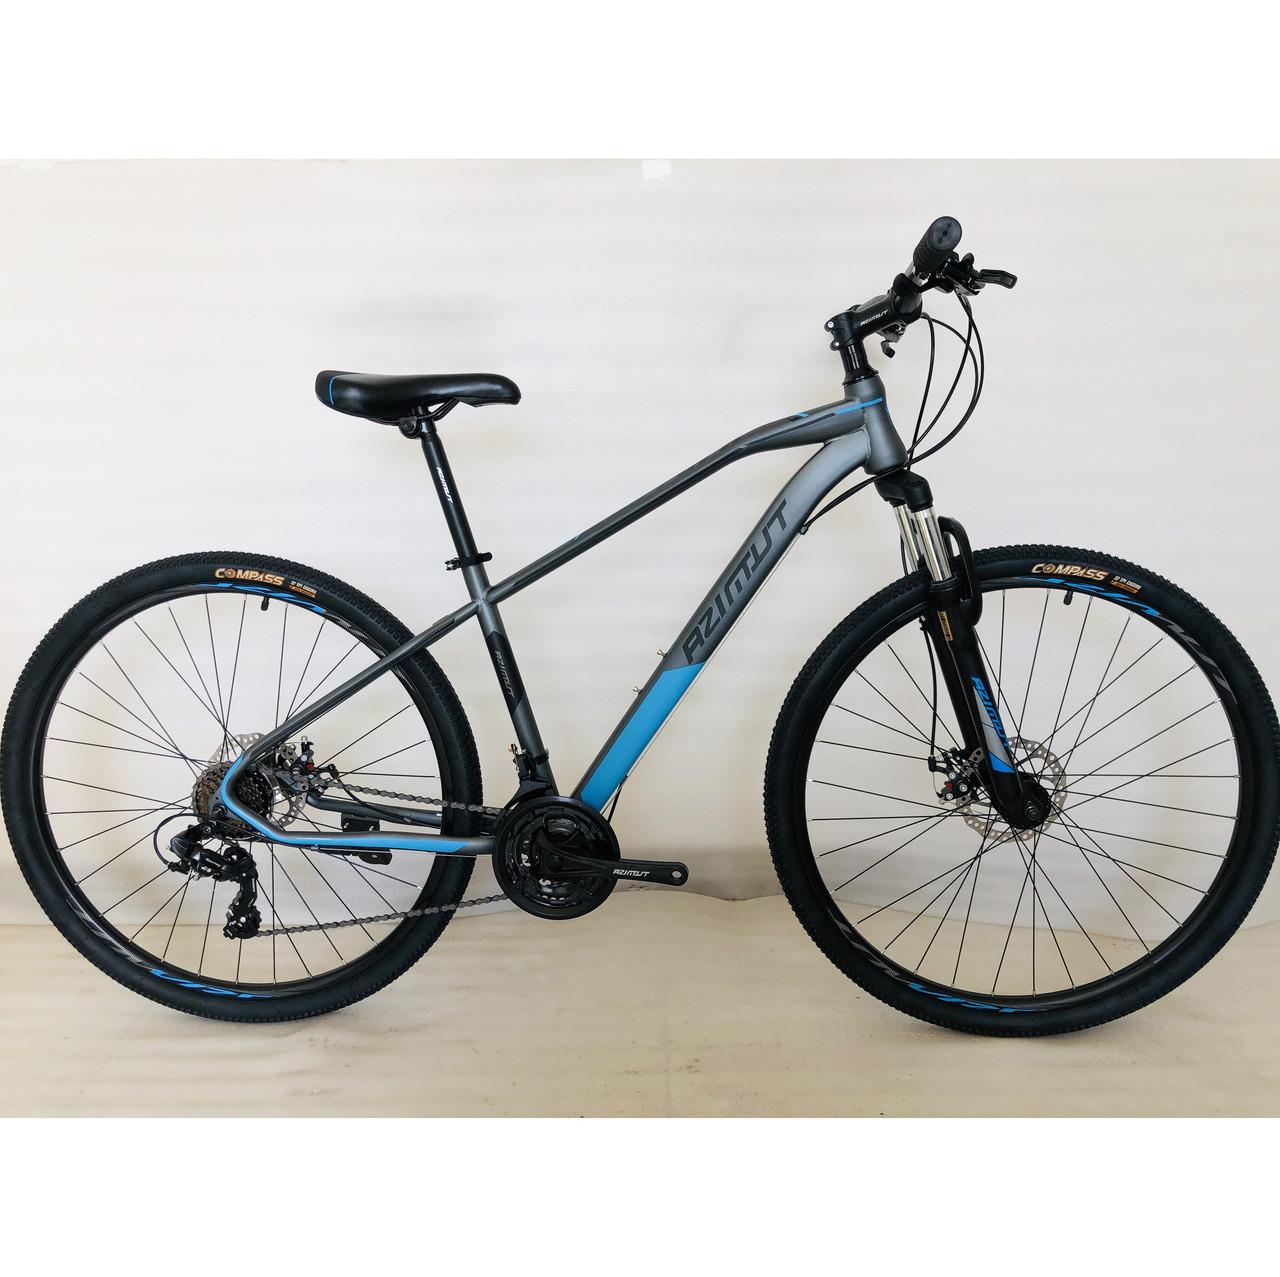 Велосипед Azimut Gemini Шимано GFRD 26 х 15.5